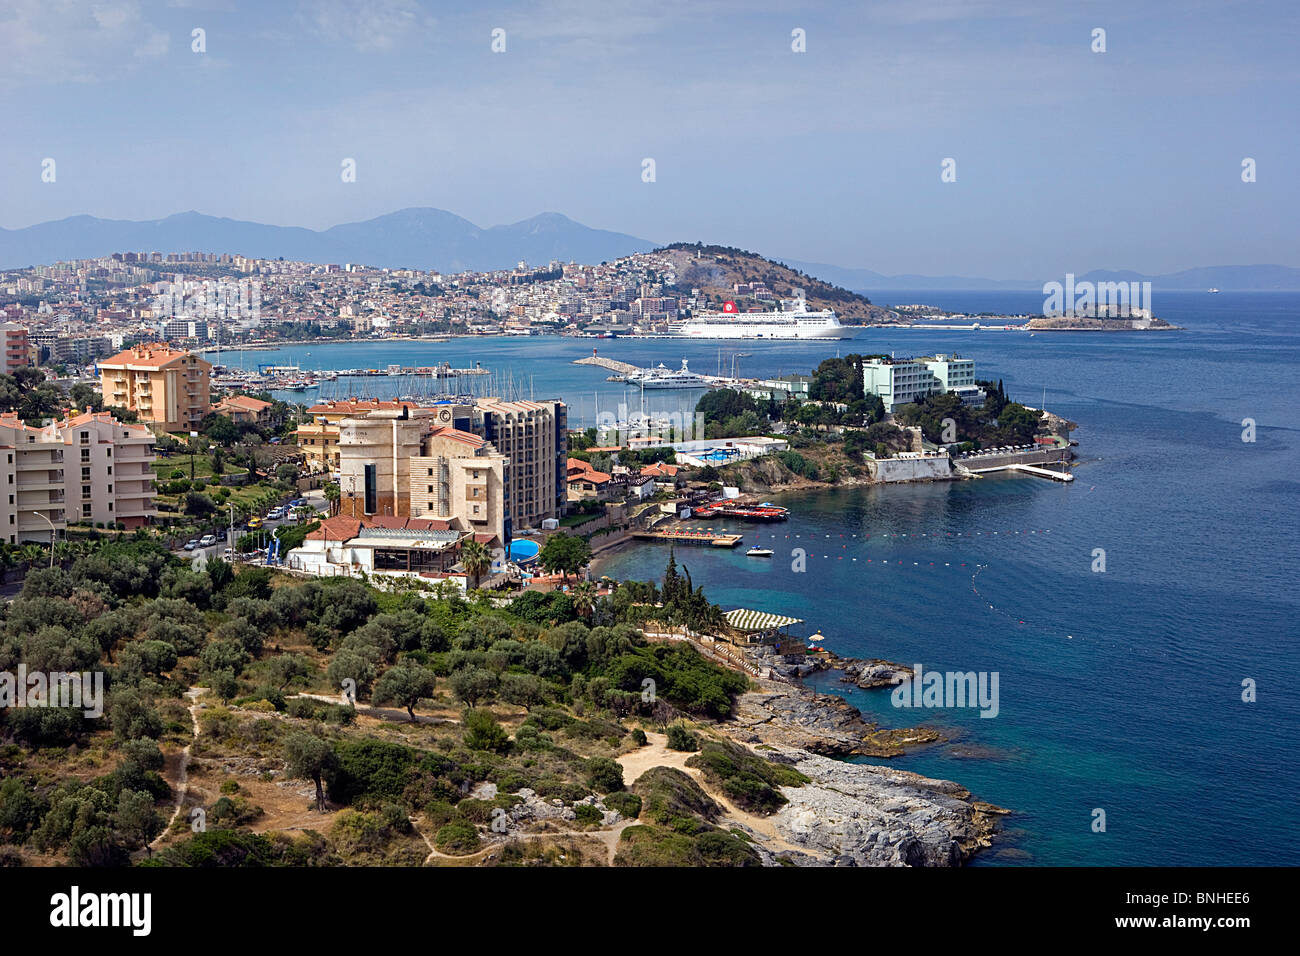 Juni 2008 Türkei Kusadasi Stadt Mittelmeerküste Stockbild